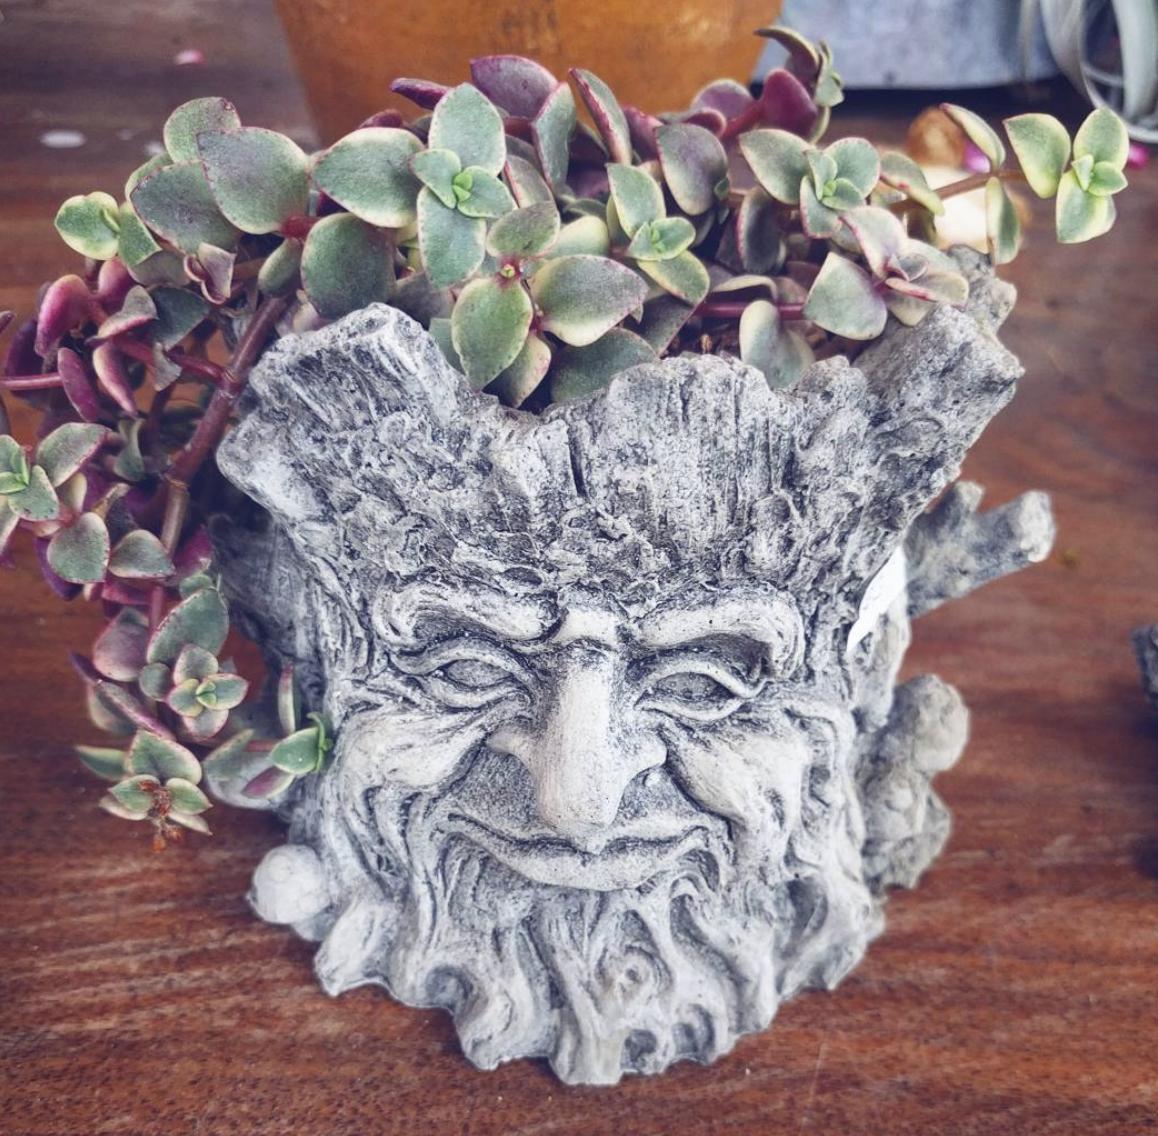 Stump Planter with Succulents